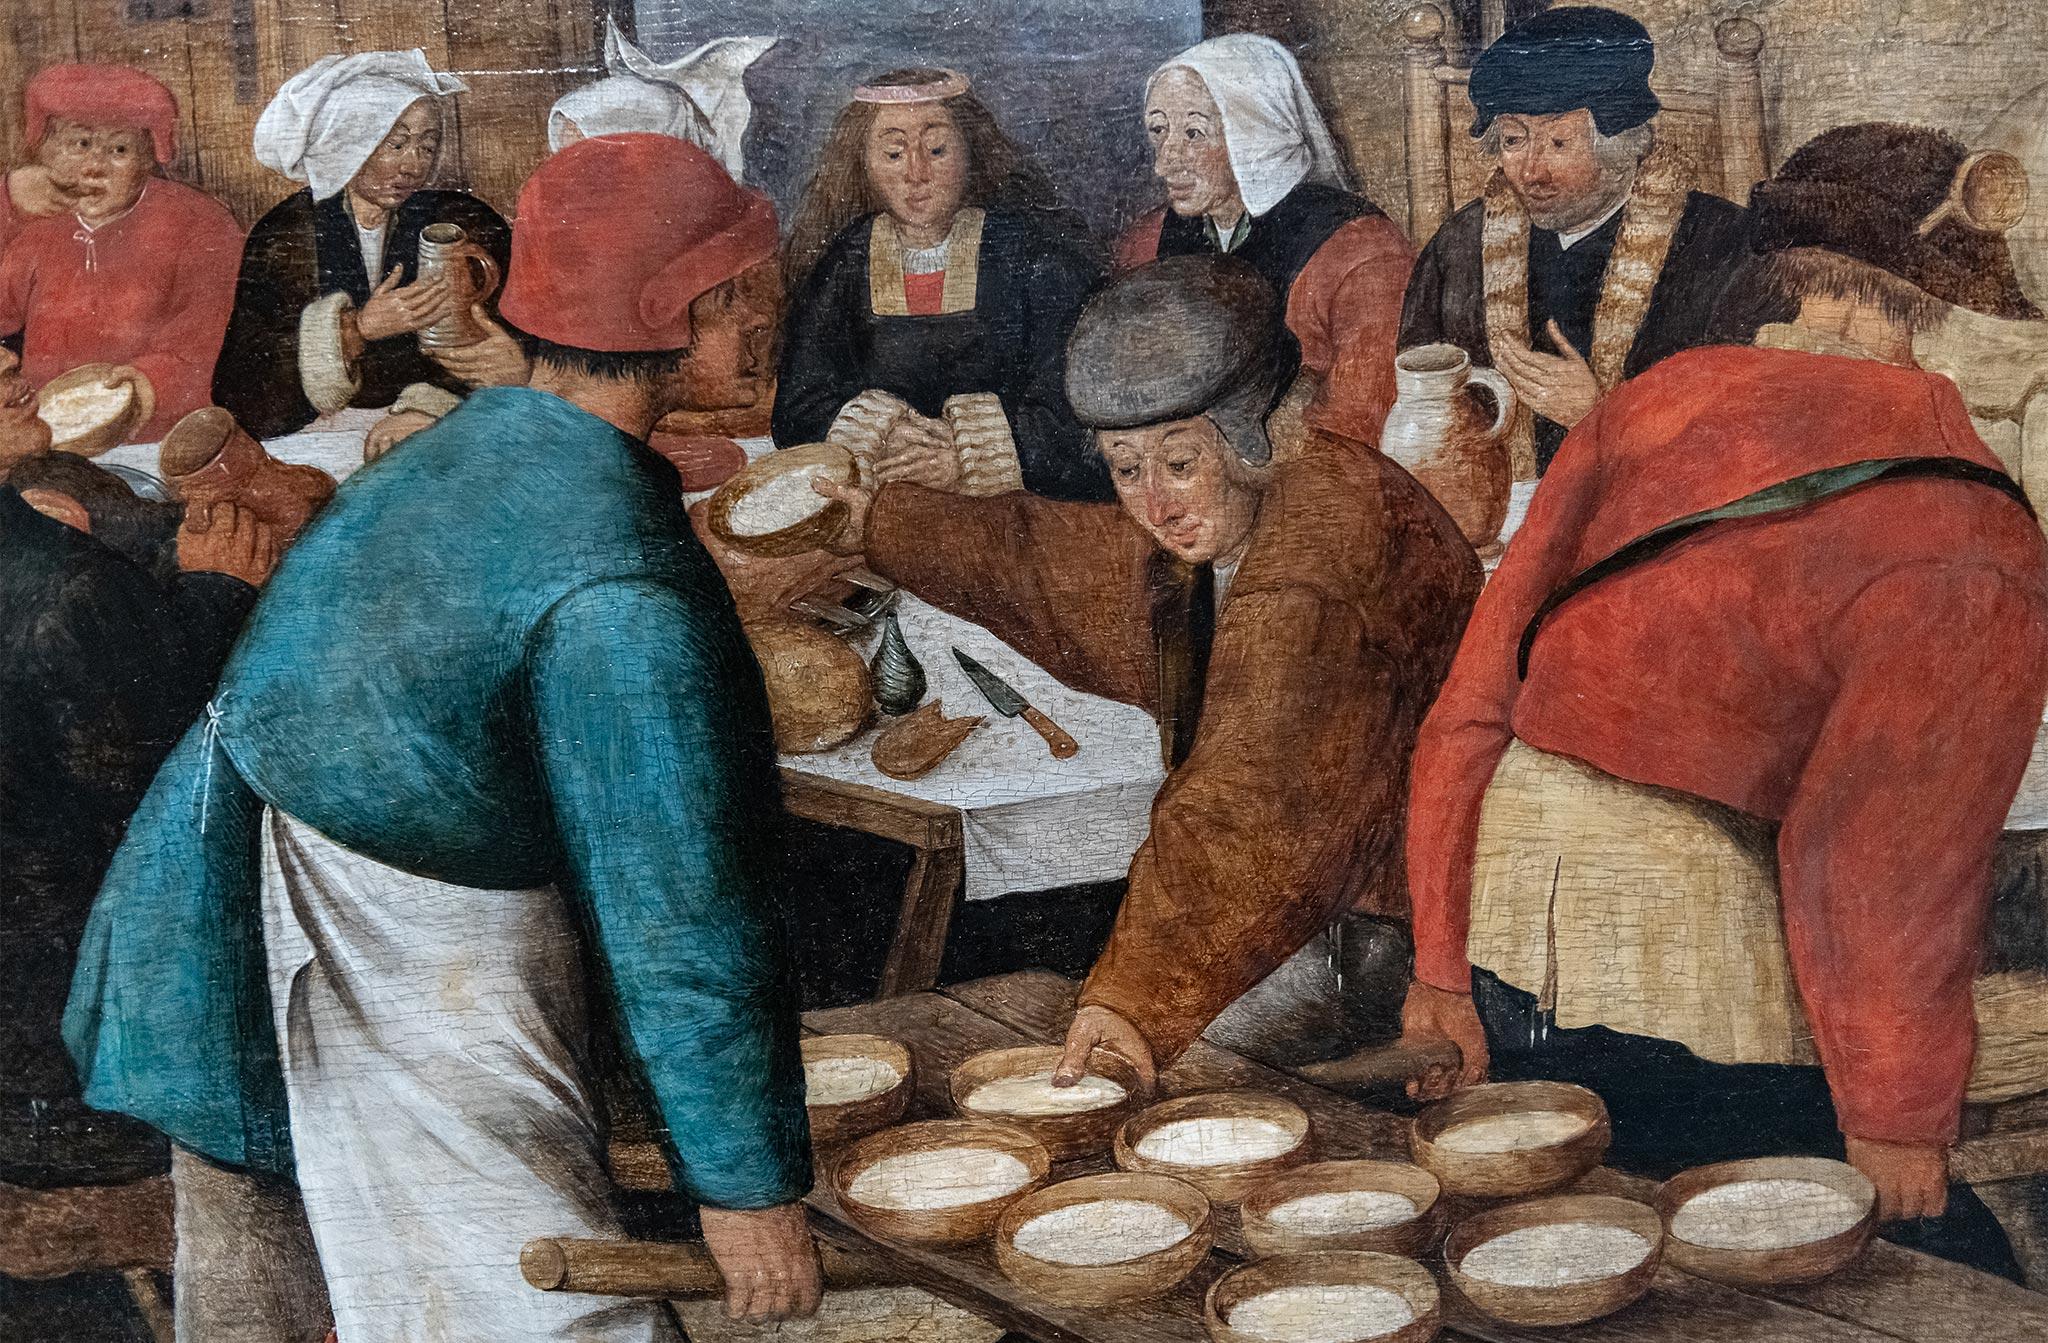 Pieter II Brueghel - Repas de Noces dans la grange - 1616 Huile sur toile: 69,9 cm x 105,2 cm S-46